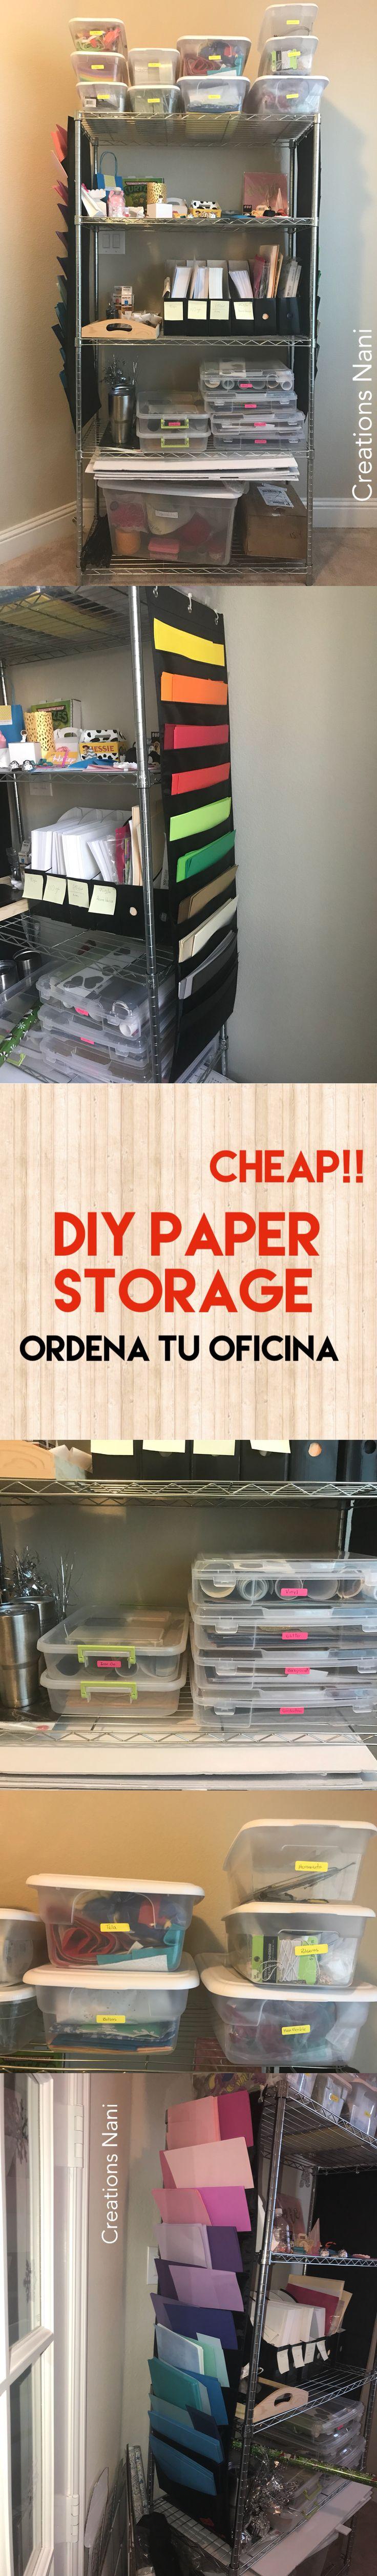 cheap !!!  DIY paper Storage   Creations Nani  Help you to organize your craft room  Ordena tu oficina  Cuarto de Manualidades  Organizador de papel